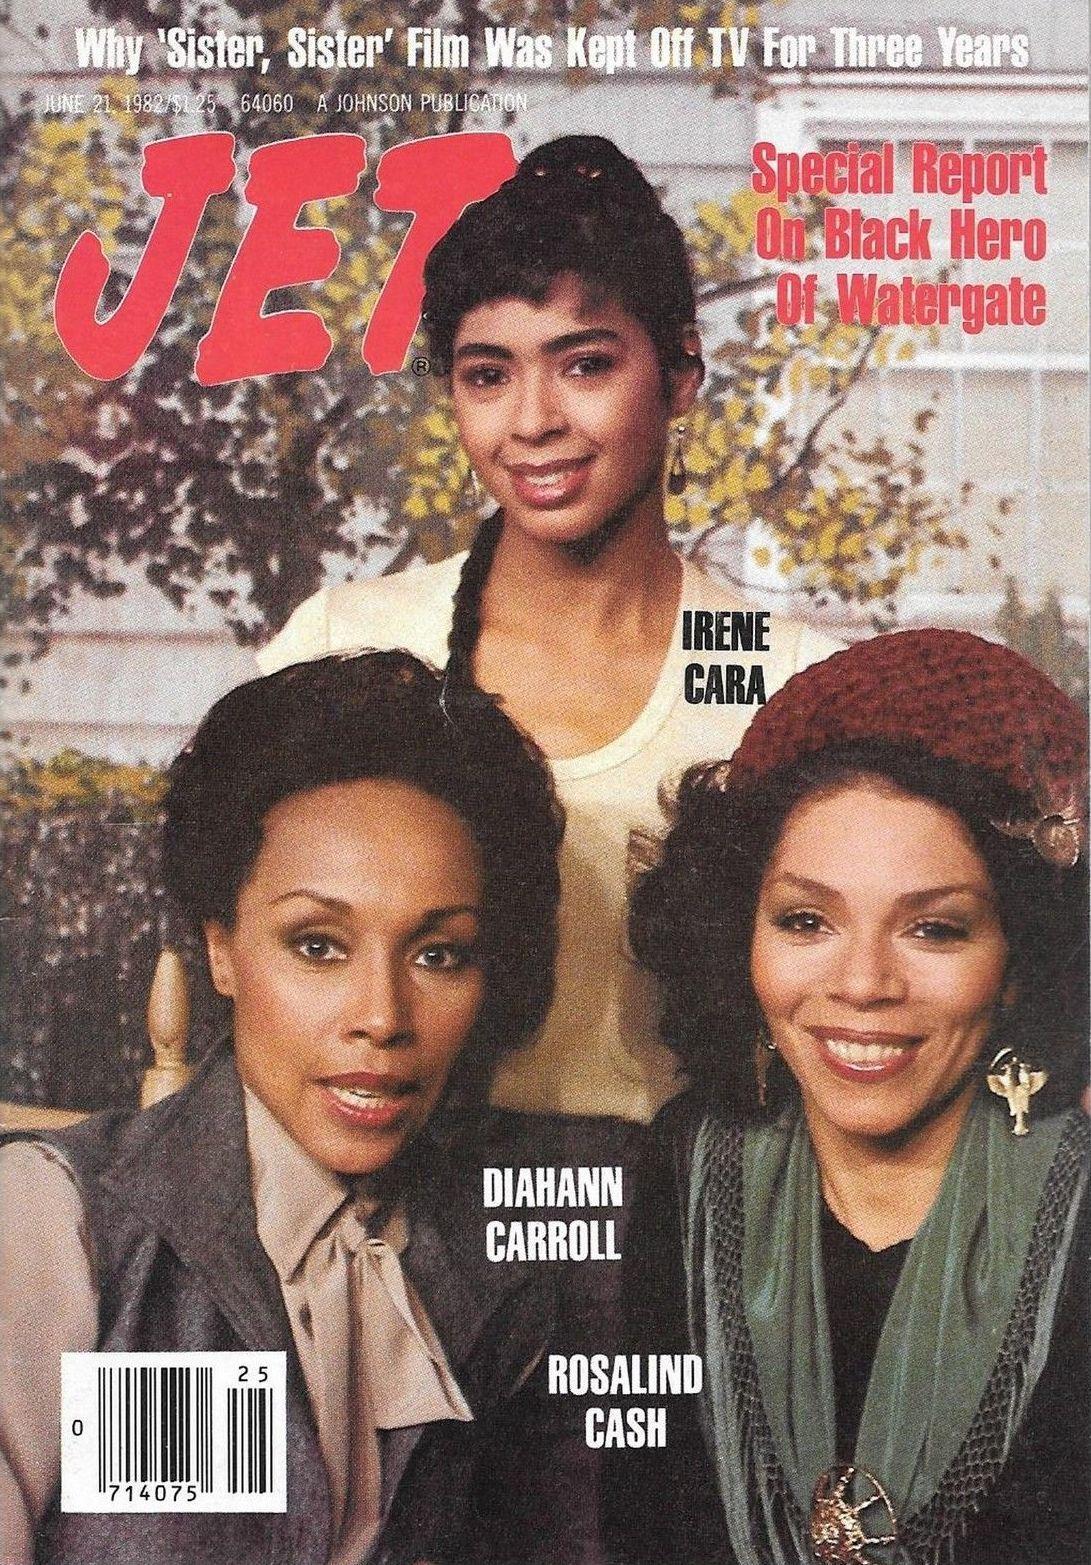 Jet Irene Cara Diahann Carroll Rosalind Cash June 1982